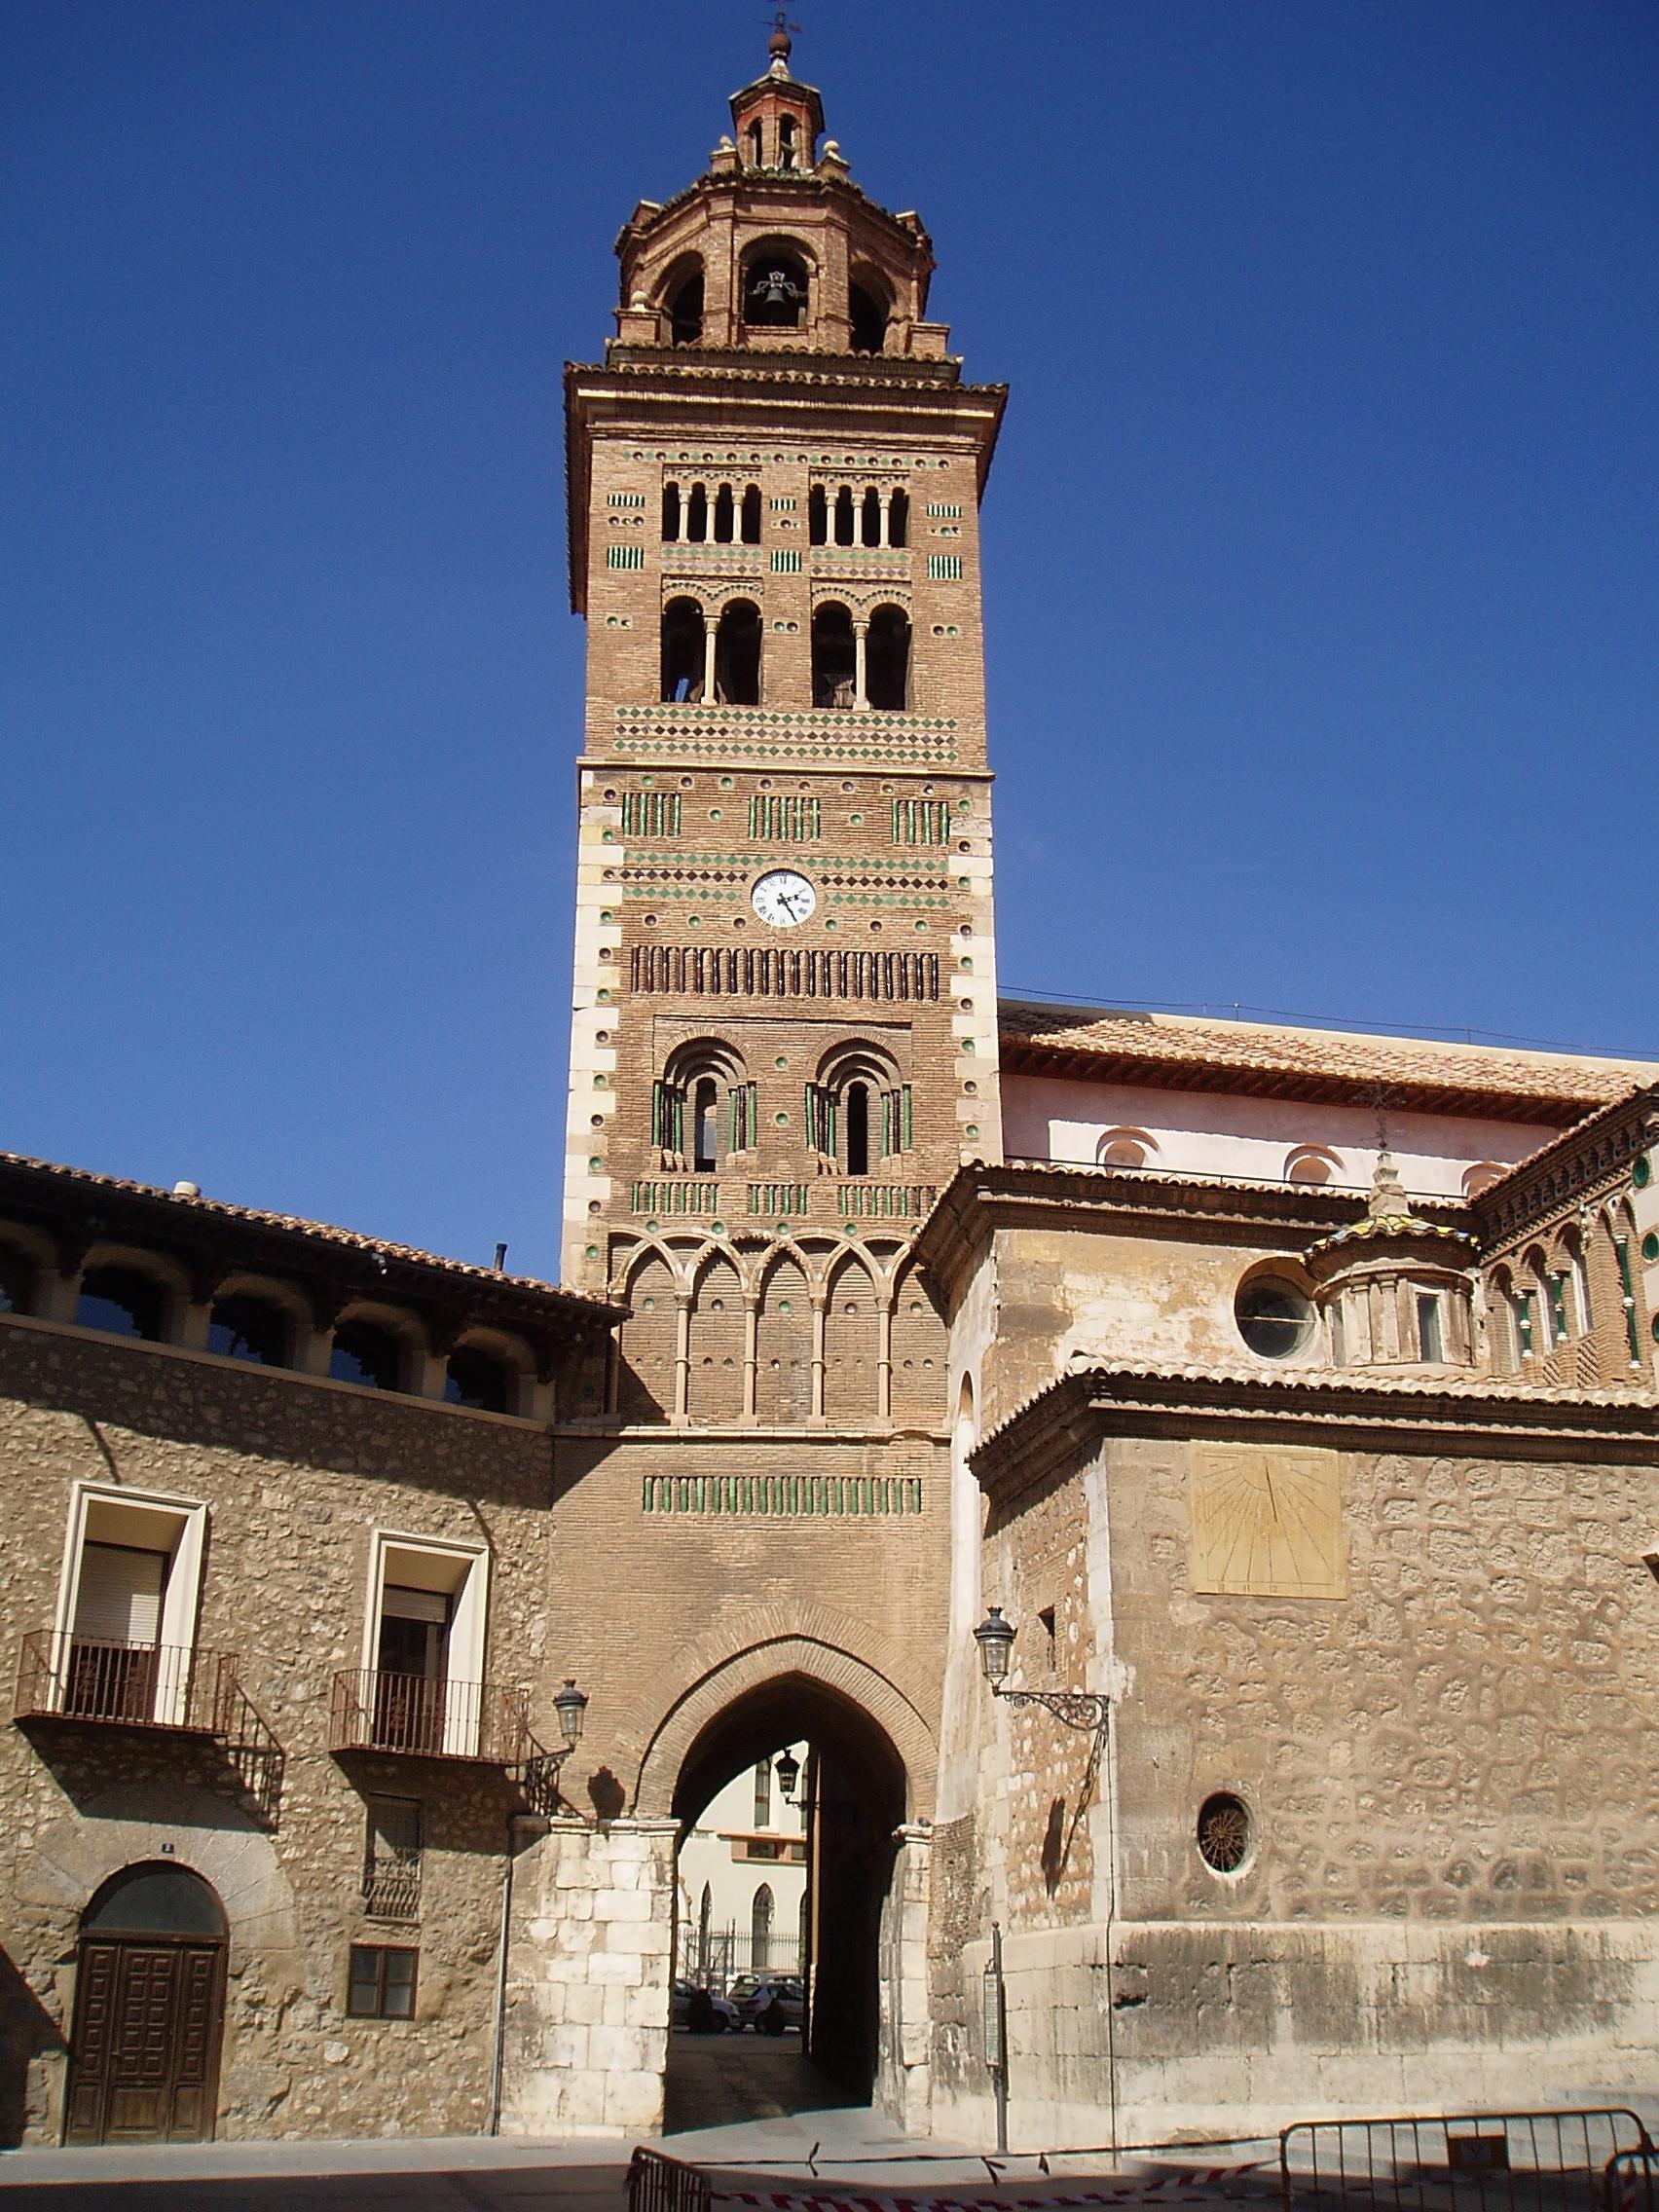 File:Torre de la Catedral de Teruel.JPG - Wikimedia Commons